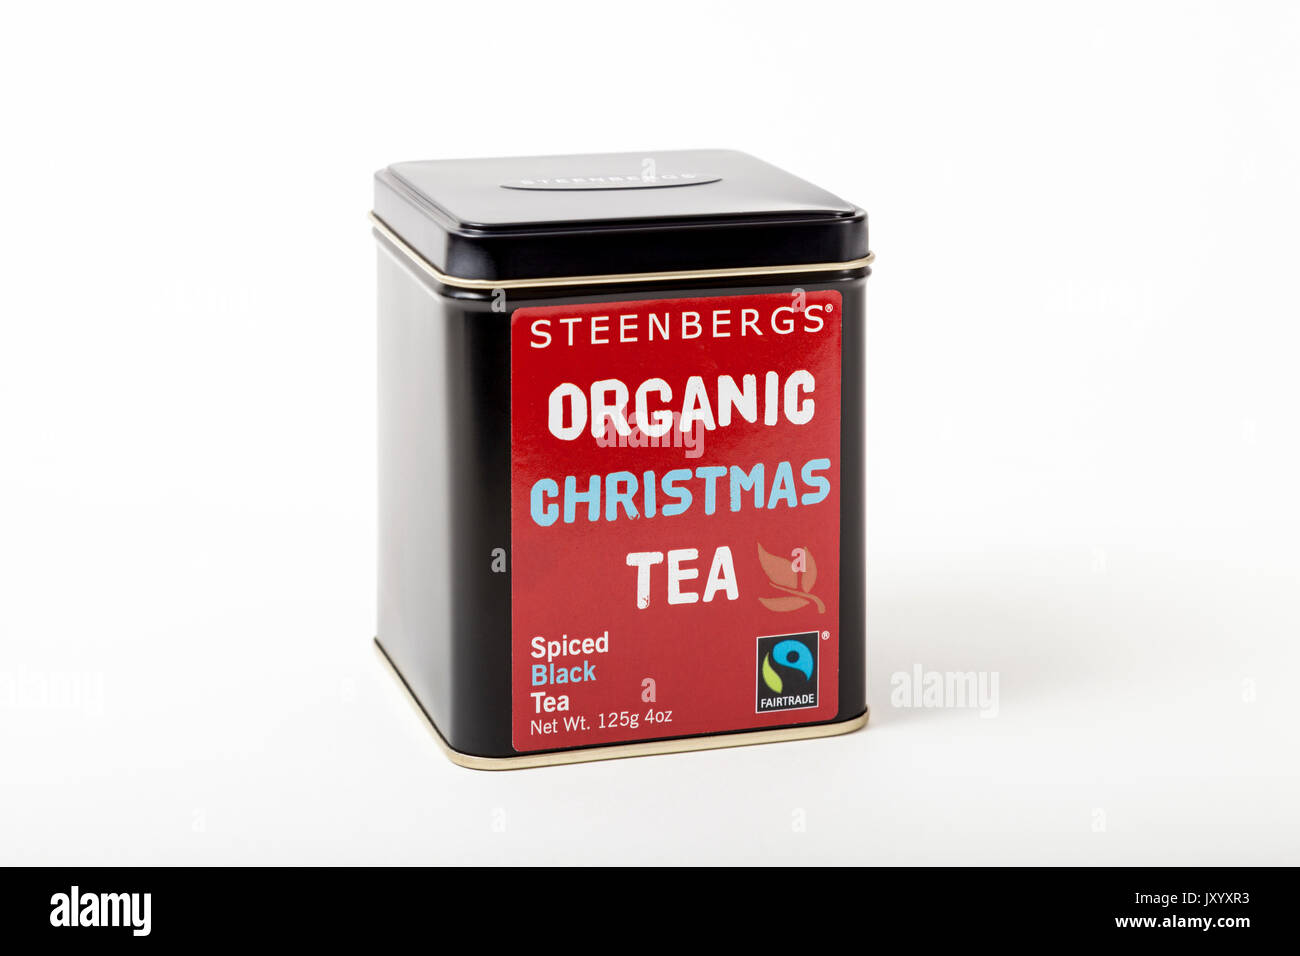 Fairtrade tea. A tea caddy of Steenberg's Organic Christmas Tea, a fairtrade product of spiced black tea. On a white background Stock Photo